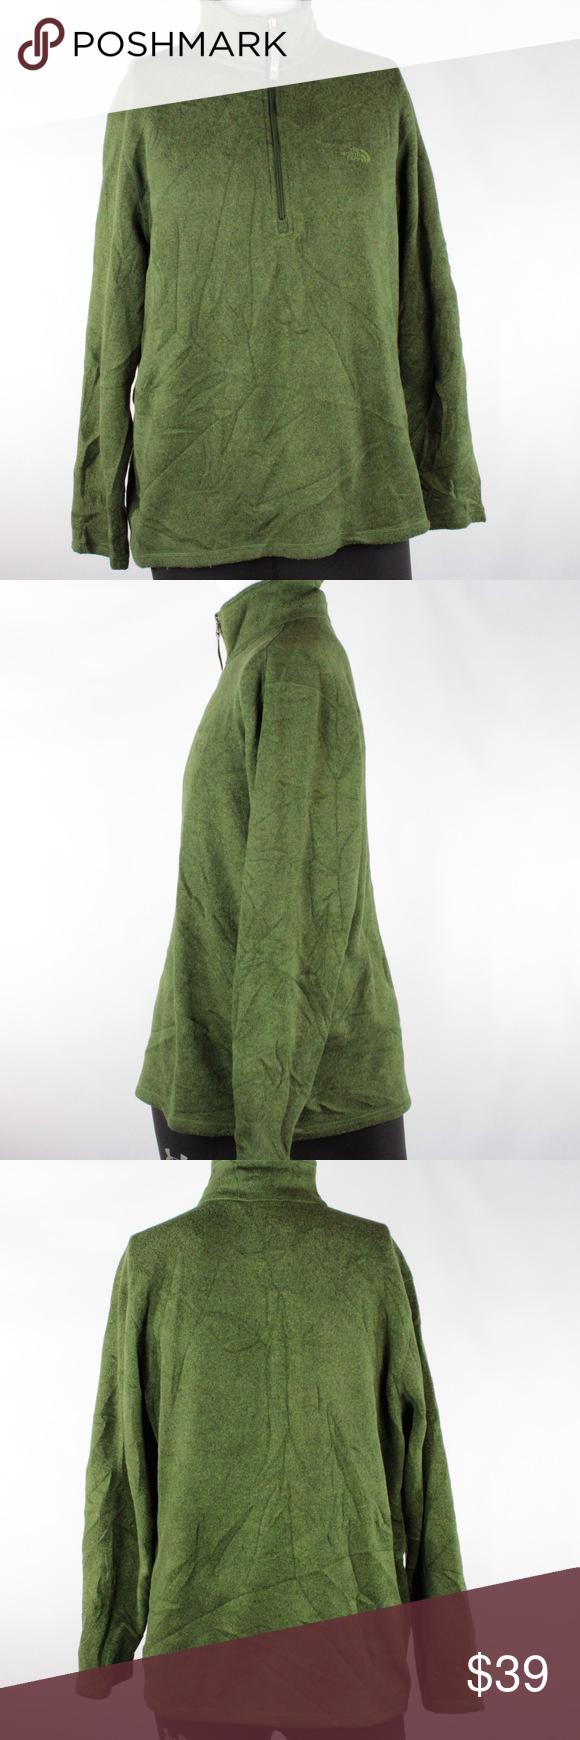 Mens Quarter Jacket Large Zip The North Face Rn61661 Ca bf76Yyg